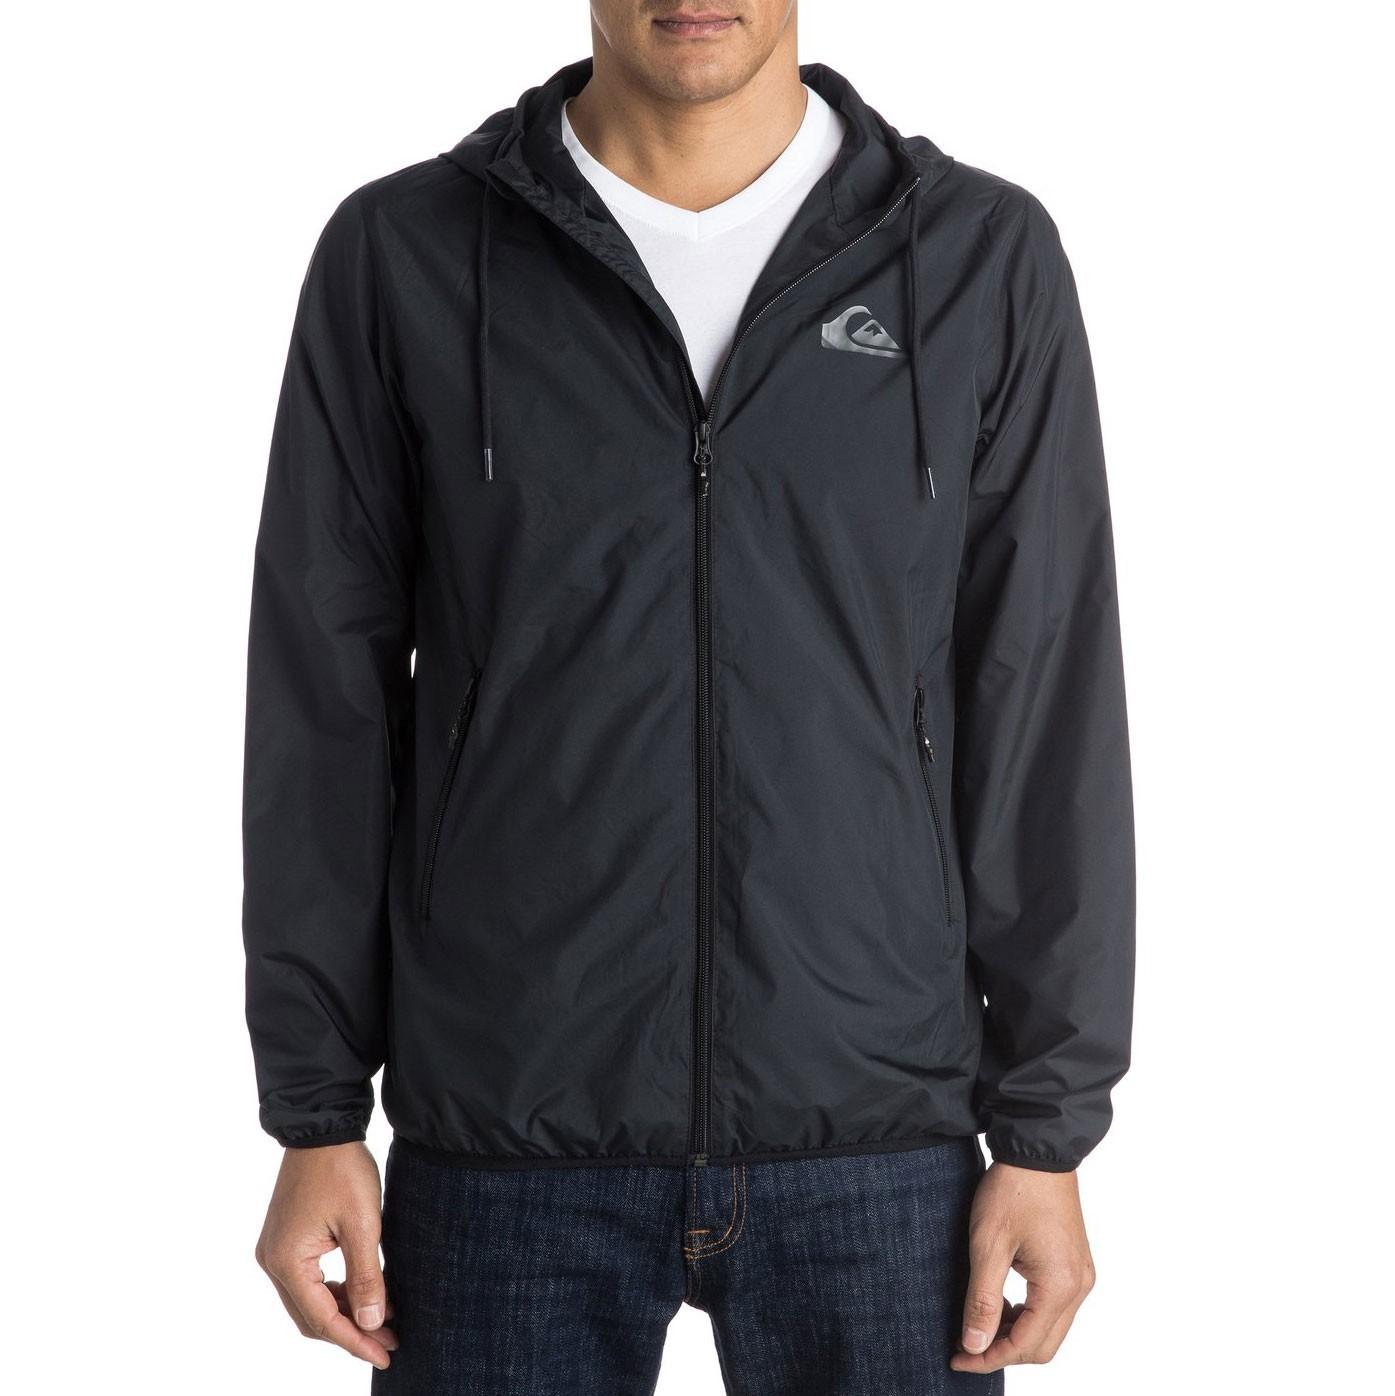 Street bunda Quiksilver Everyday Jacket black